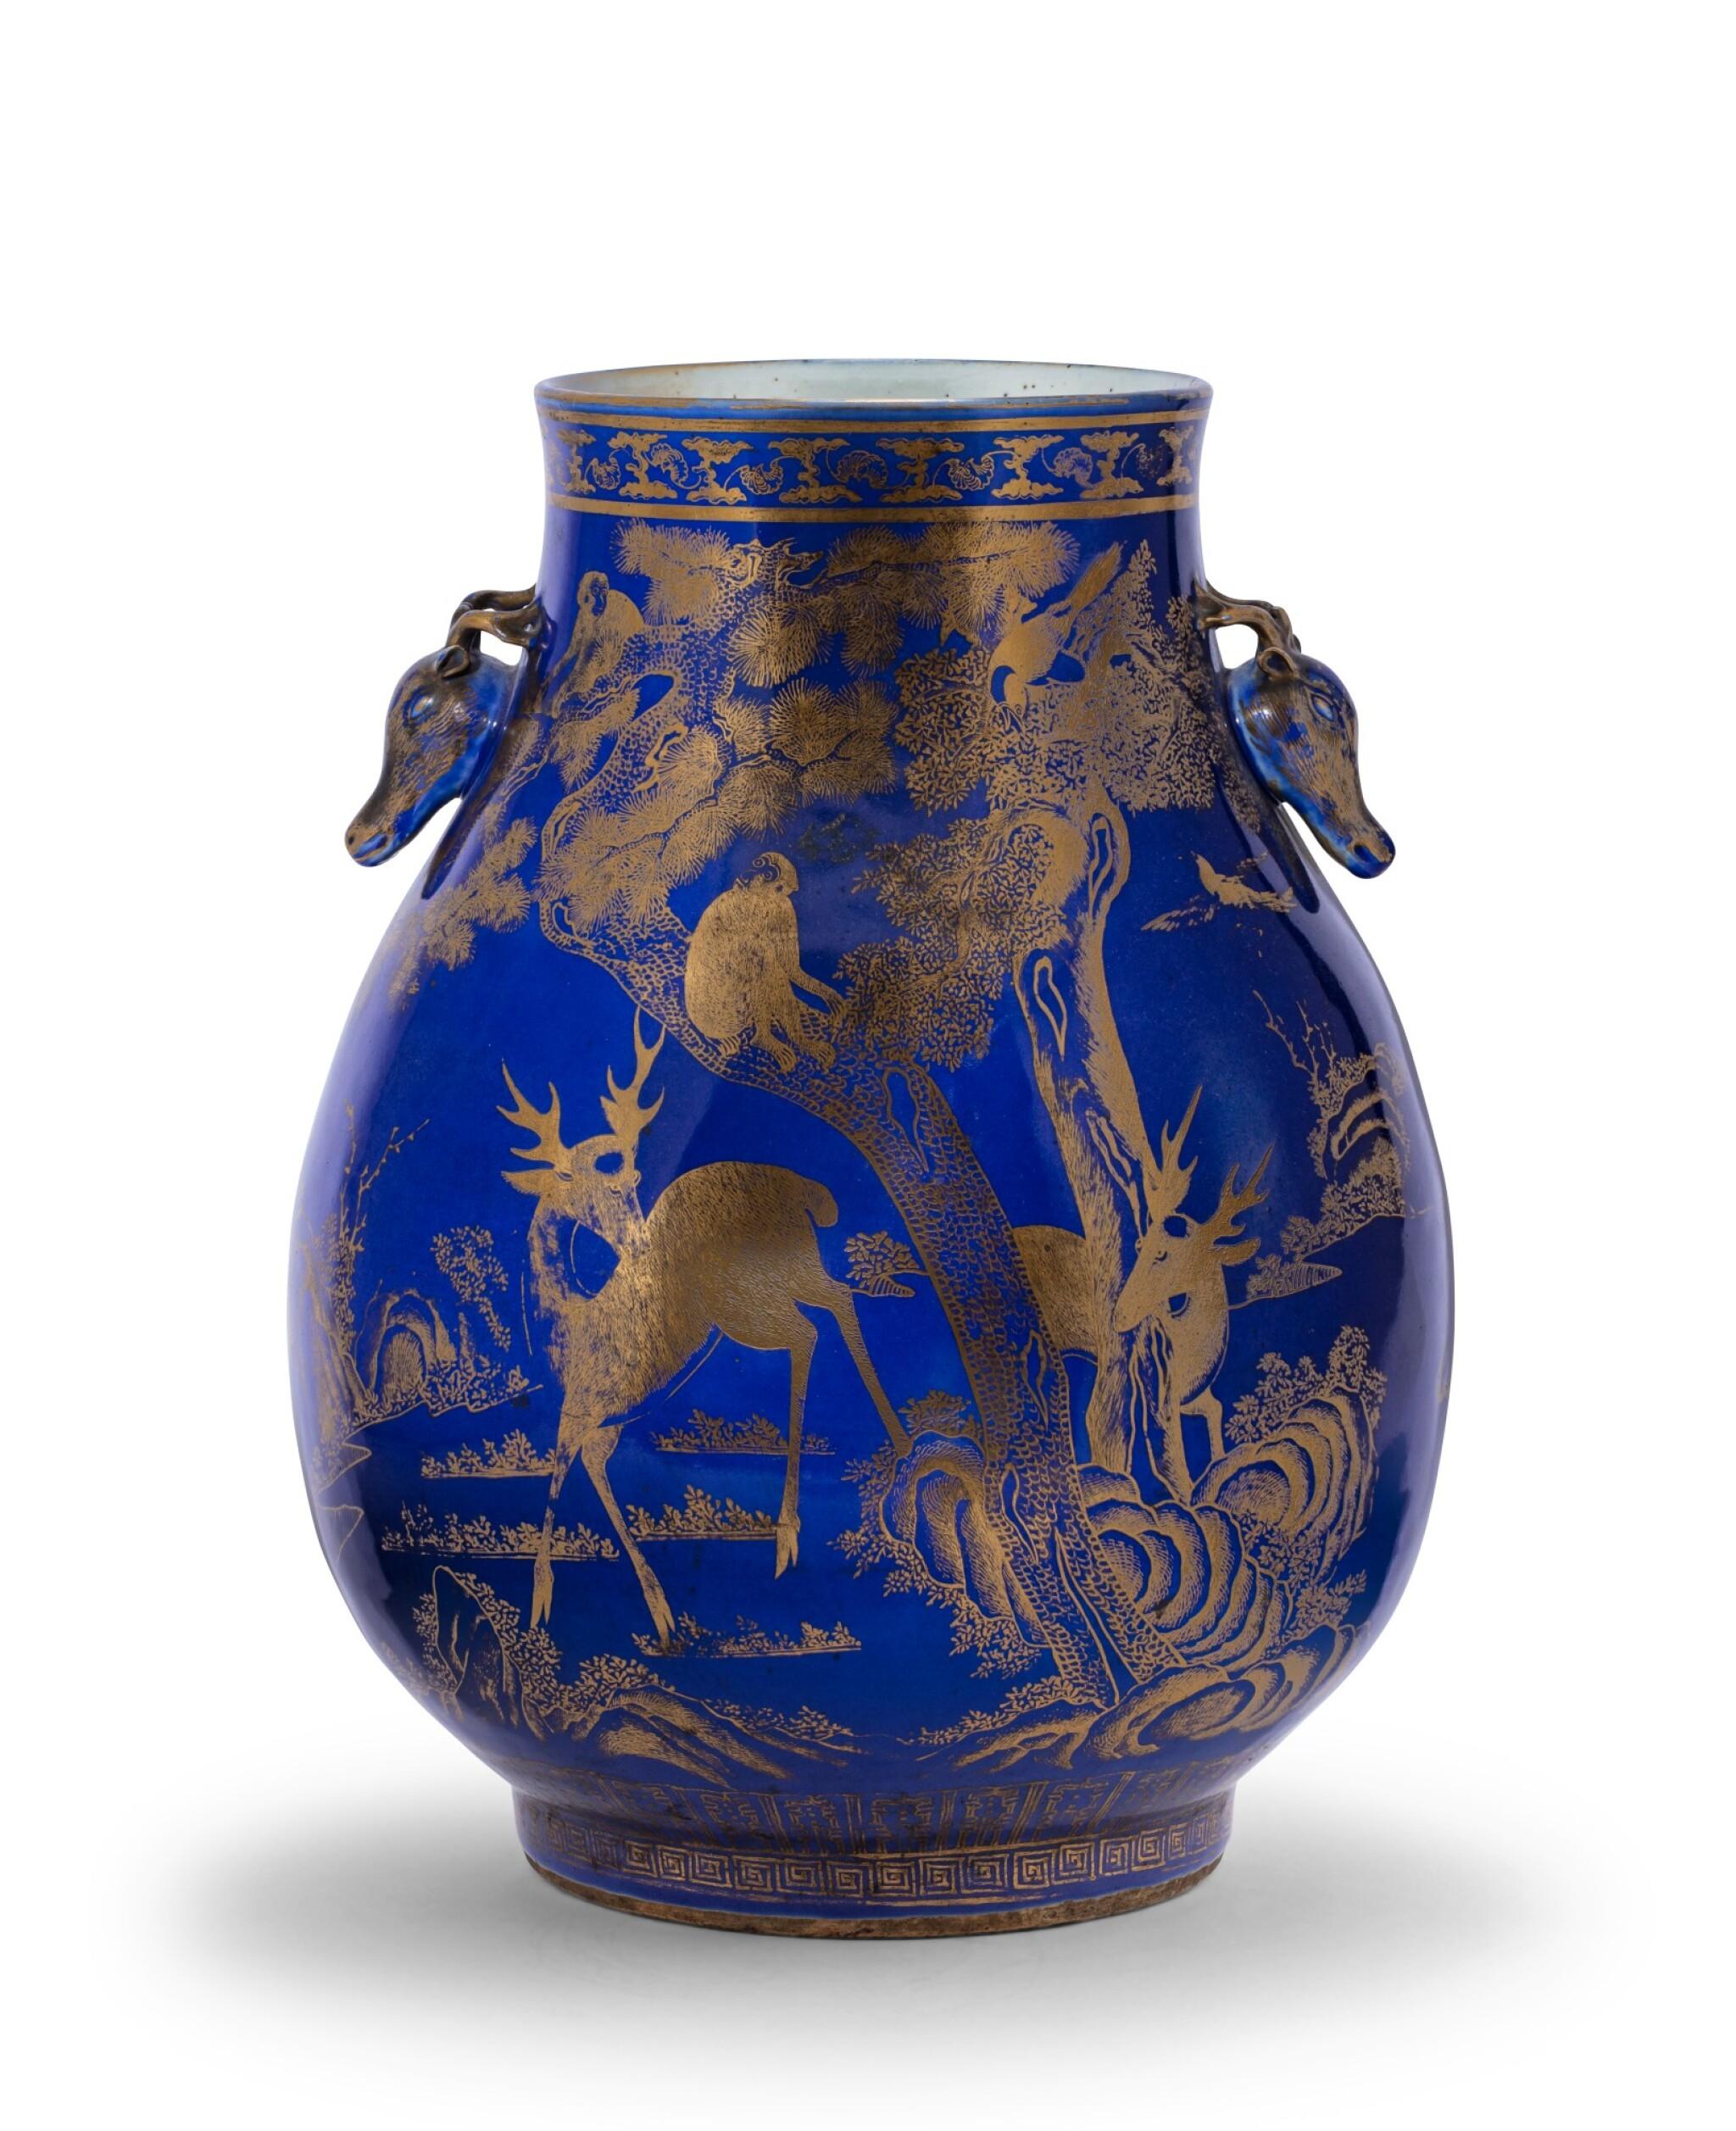 View 1 of Lot 235. Vase en porcelaine à fond bleu émaillé or à décor de daims, hu Dynastie Qing, XIXE siècle | 清十九世紀 霽藍地描金瑞獸紋鹿首耳尊 | A gilt-decorated blue-ground 'deer' vase, hu, Qing Dynasty, 19th century.